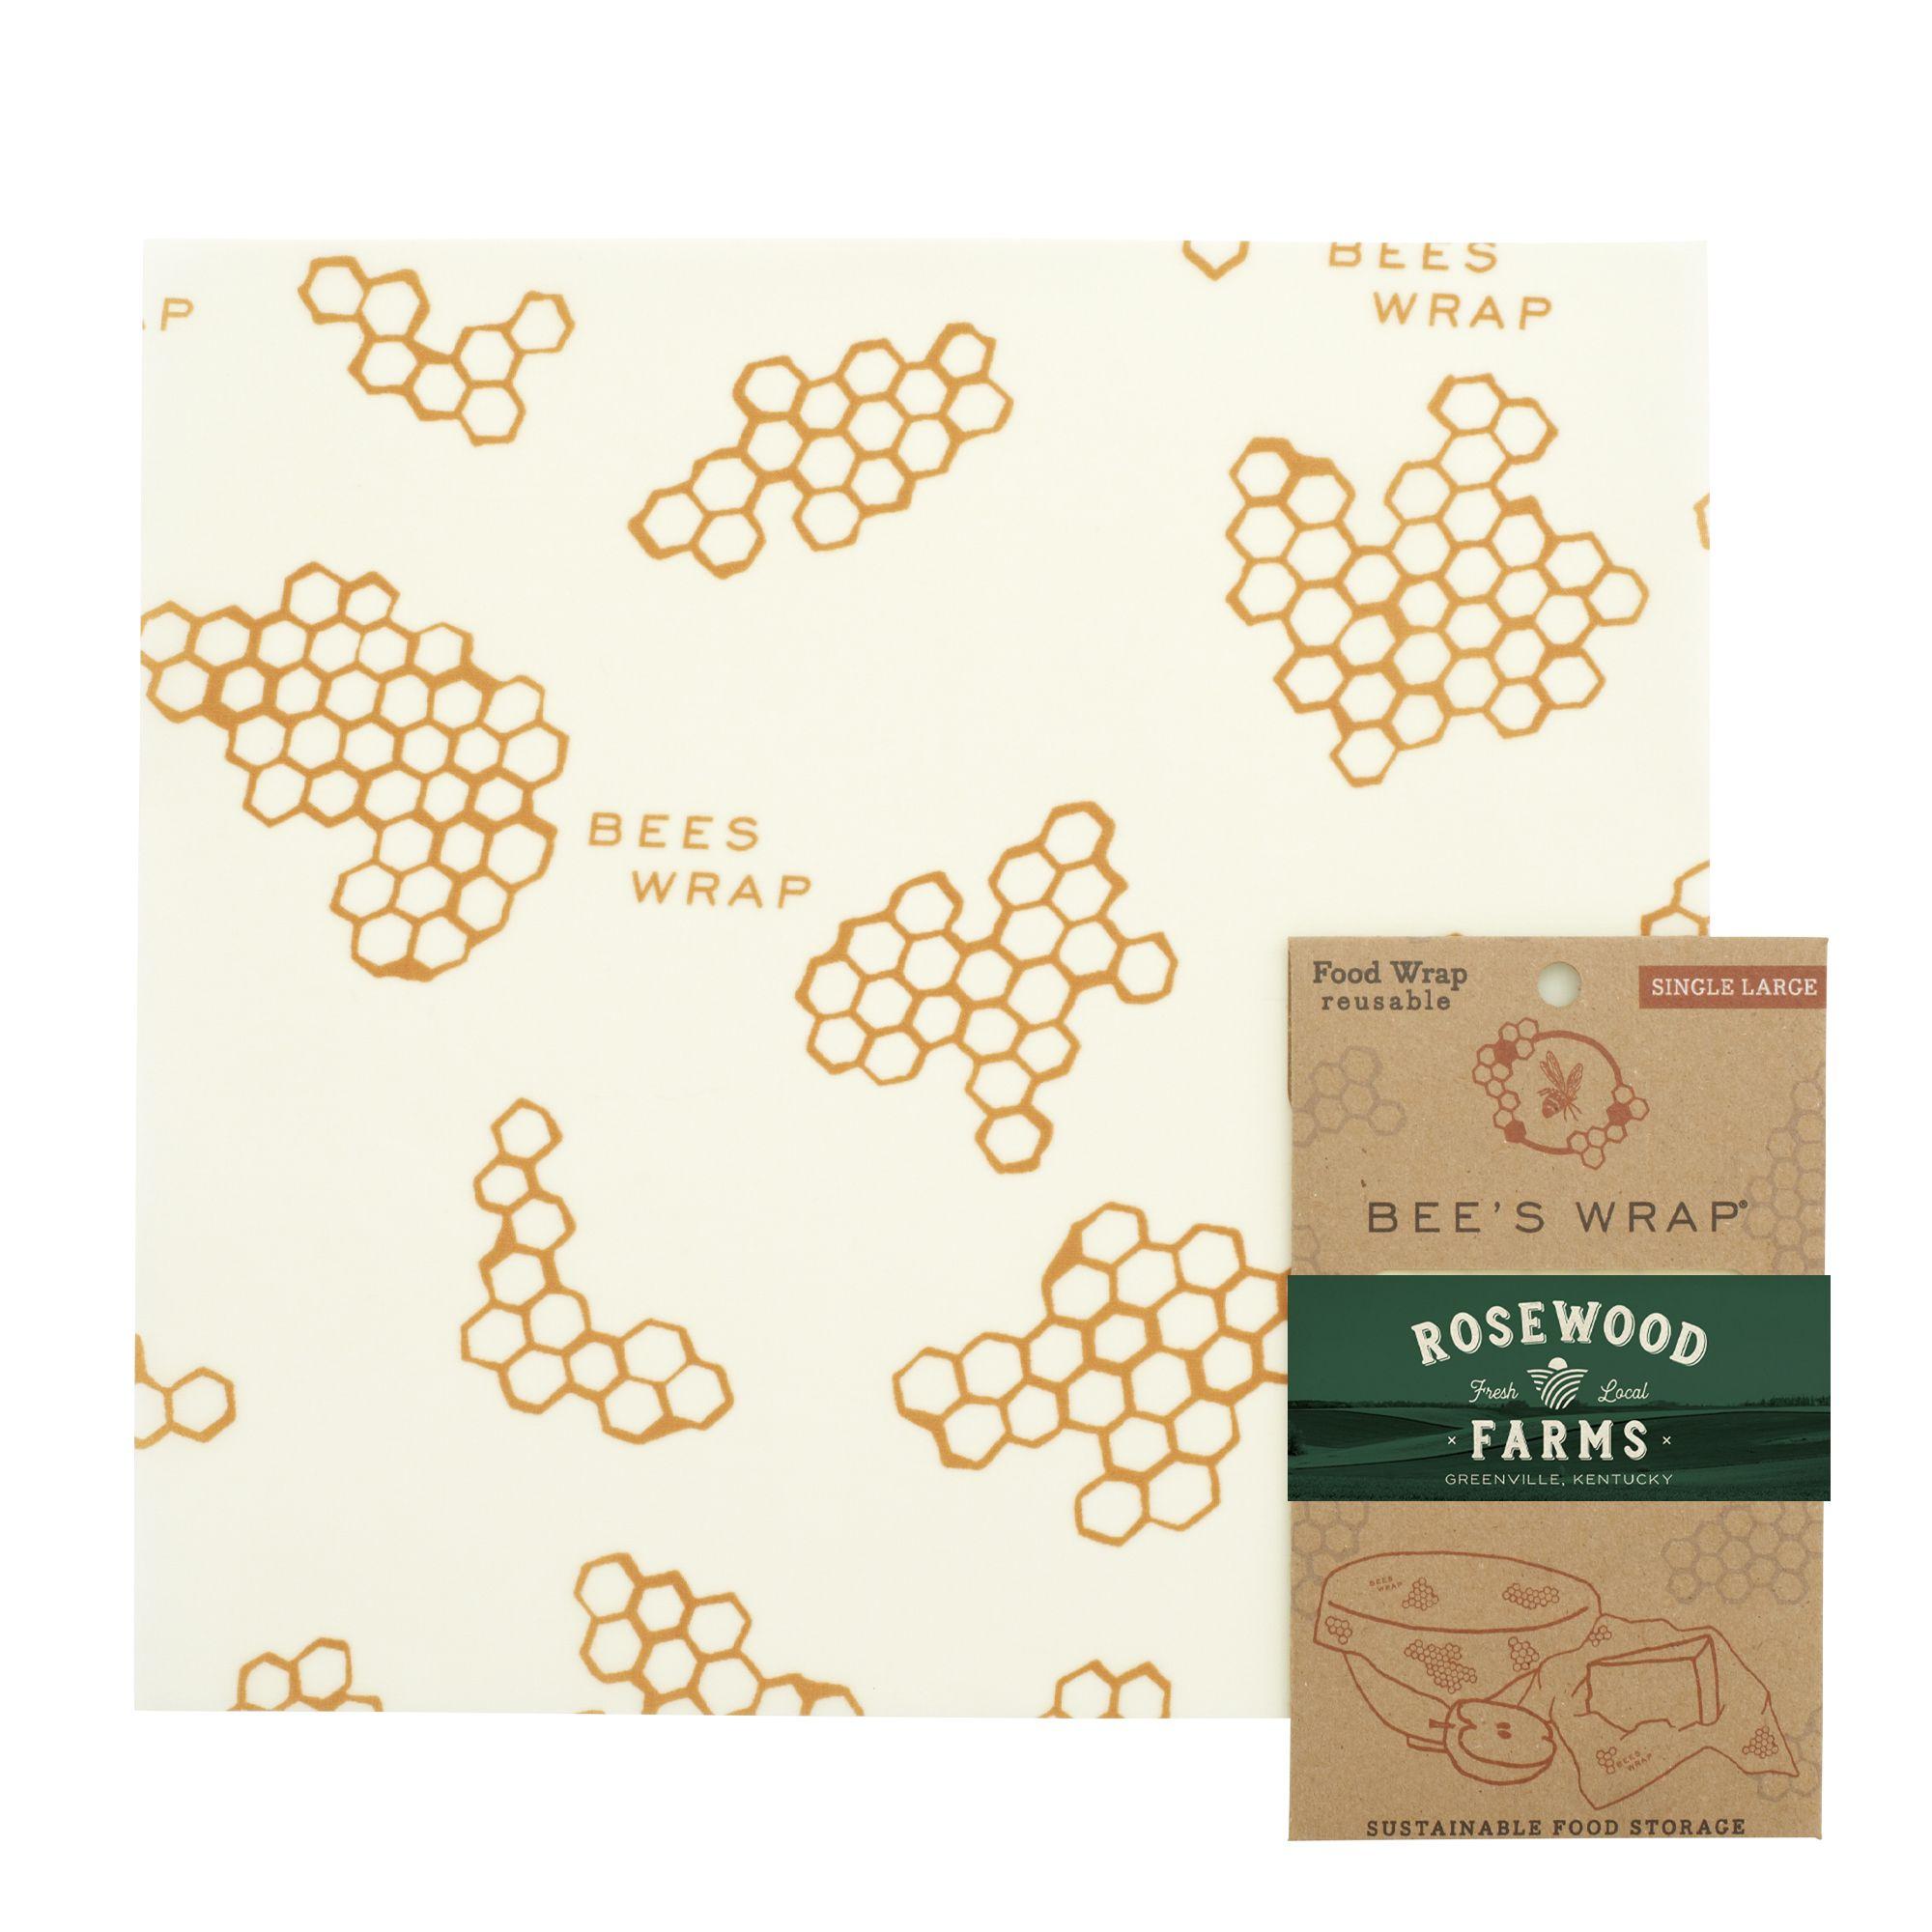 beeswrap single jk 9060